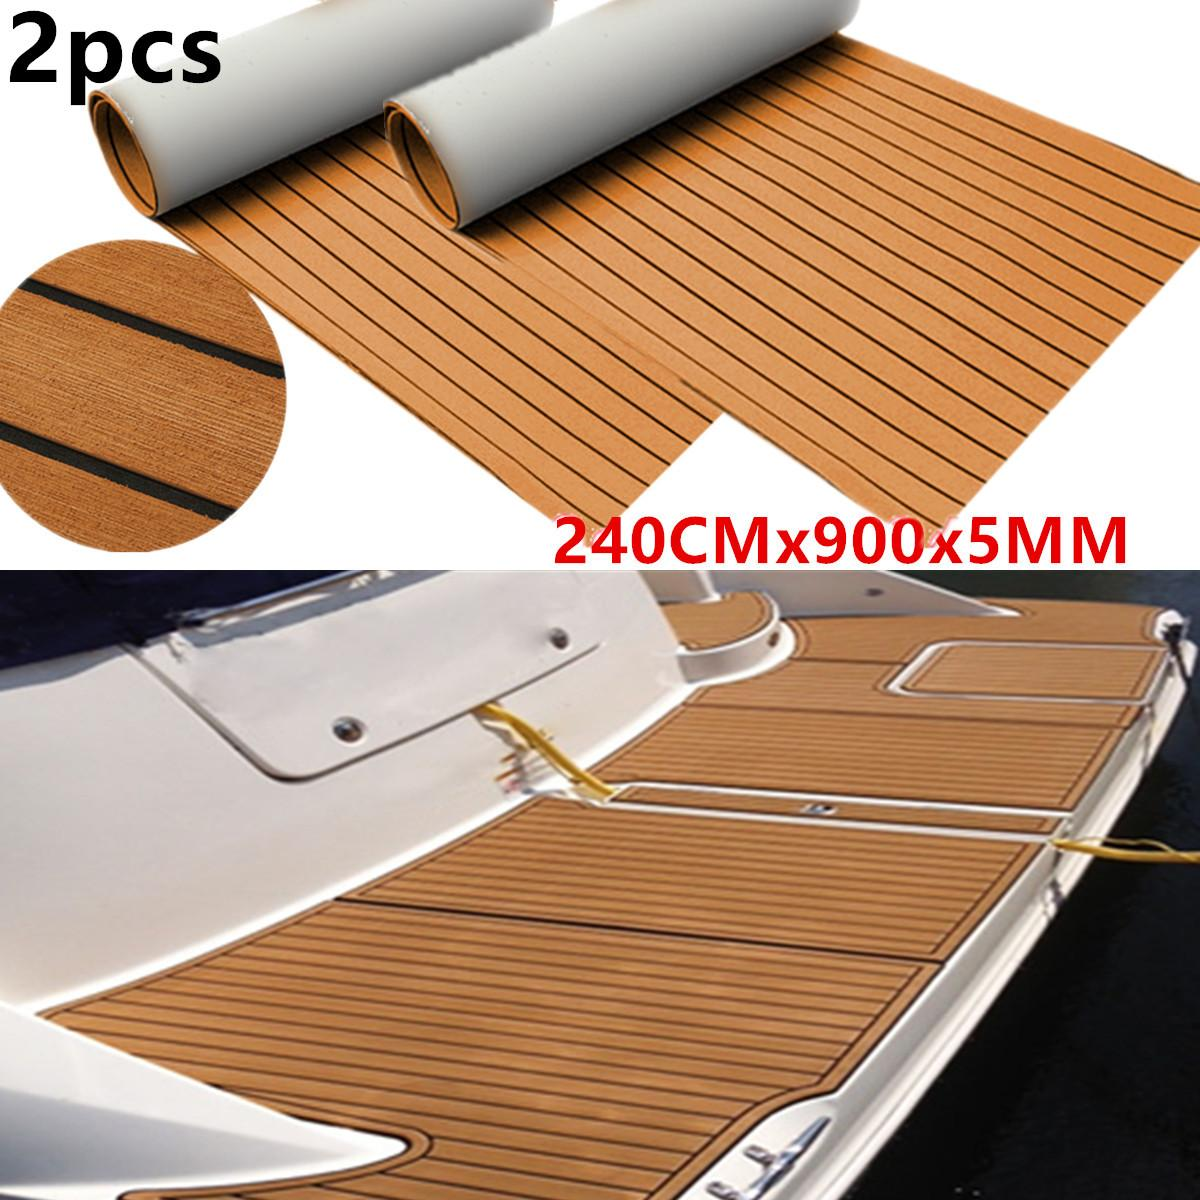 Imitated Teak Boat Deck Mat Brown Yacht